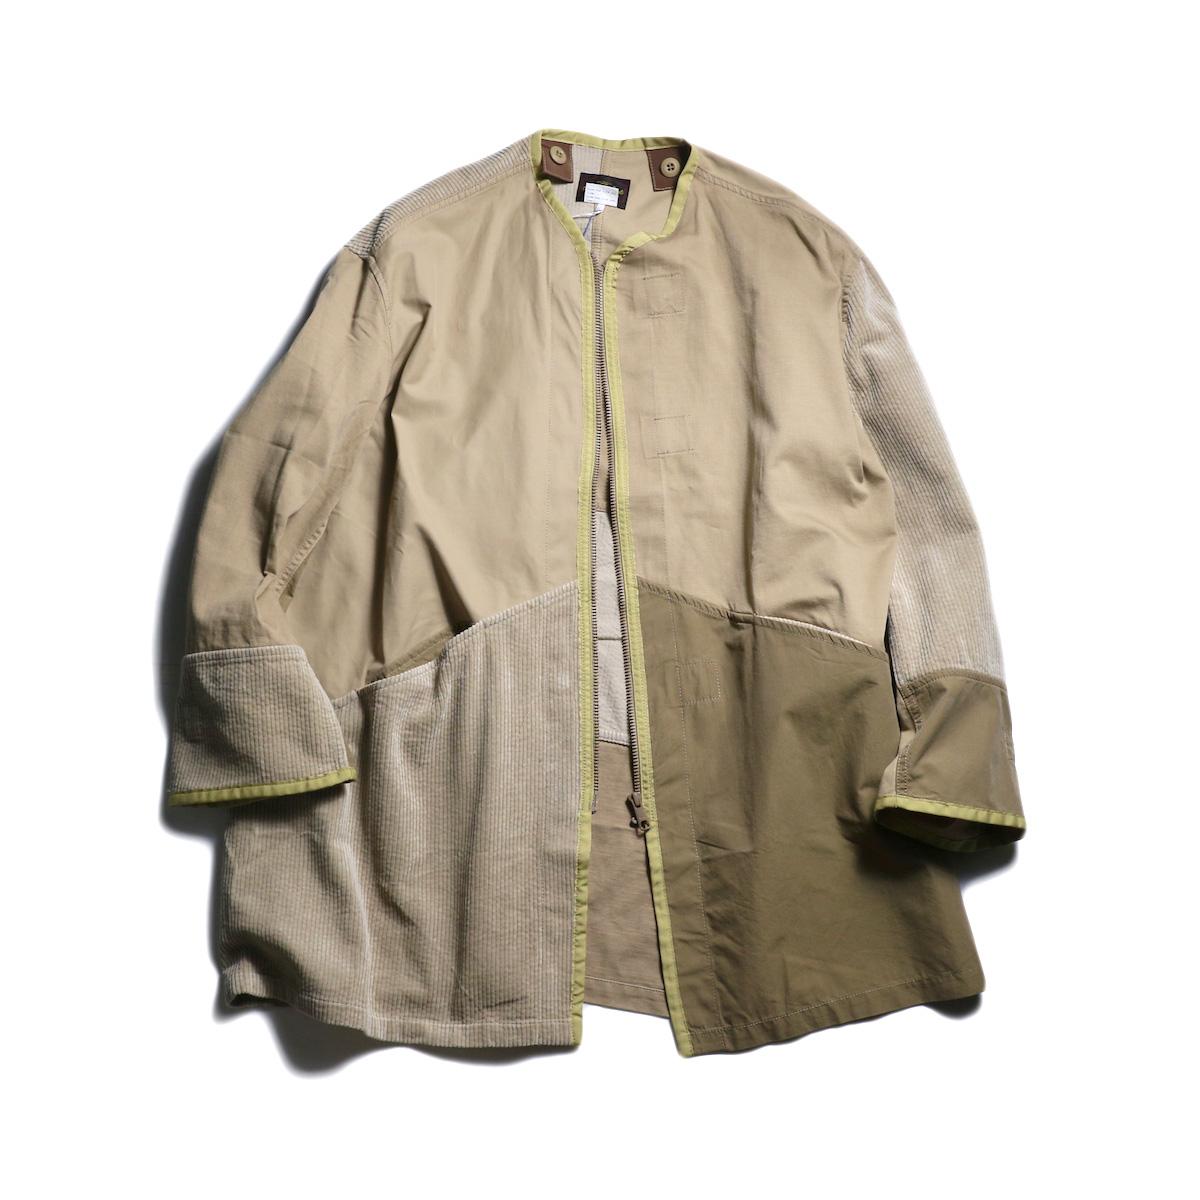 sunny sports / asymmetry coat (Khaki)